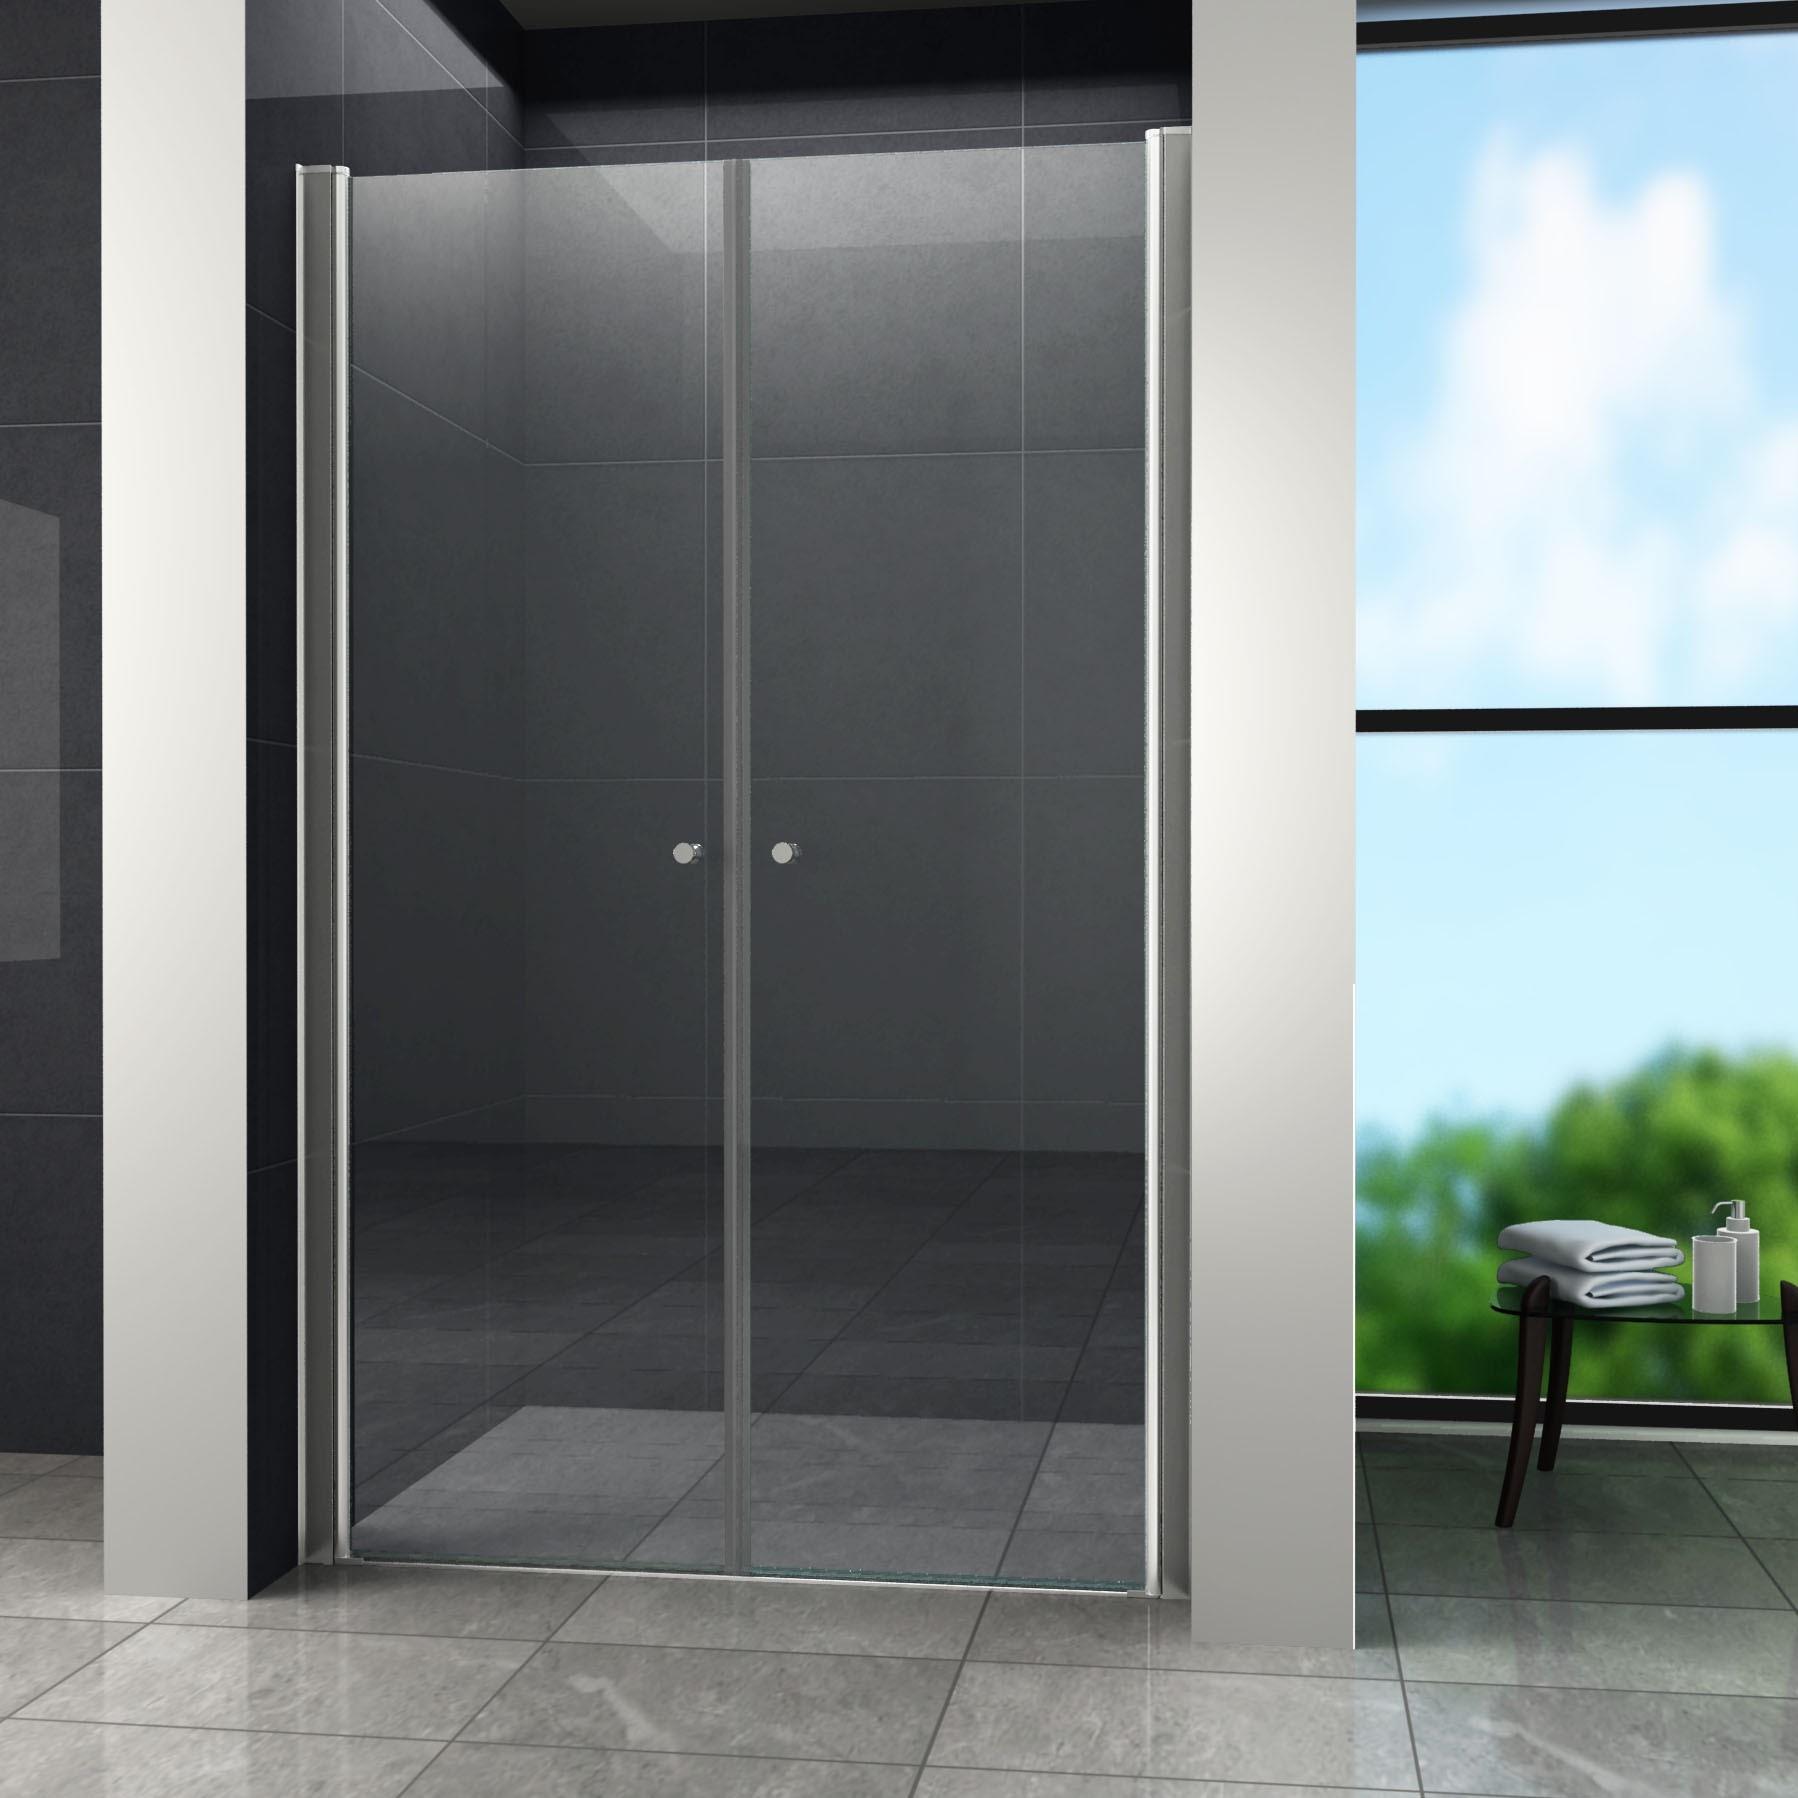 Swing Douchedeur Pendeldeur 95x180 cm Helder Glas binnen 4 tot 7 werkdagen in huis met voordeel